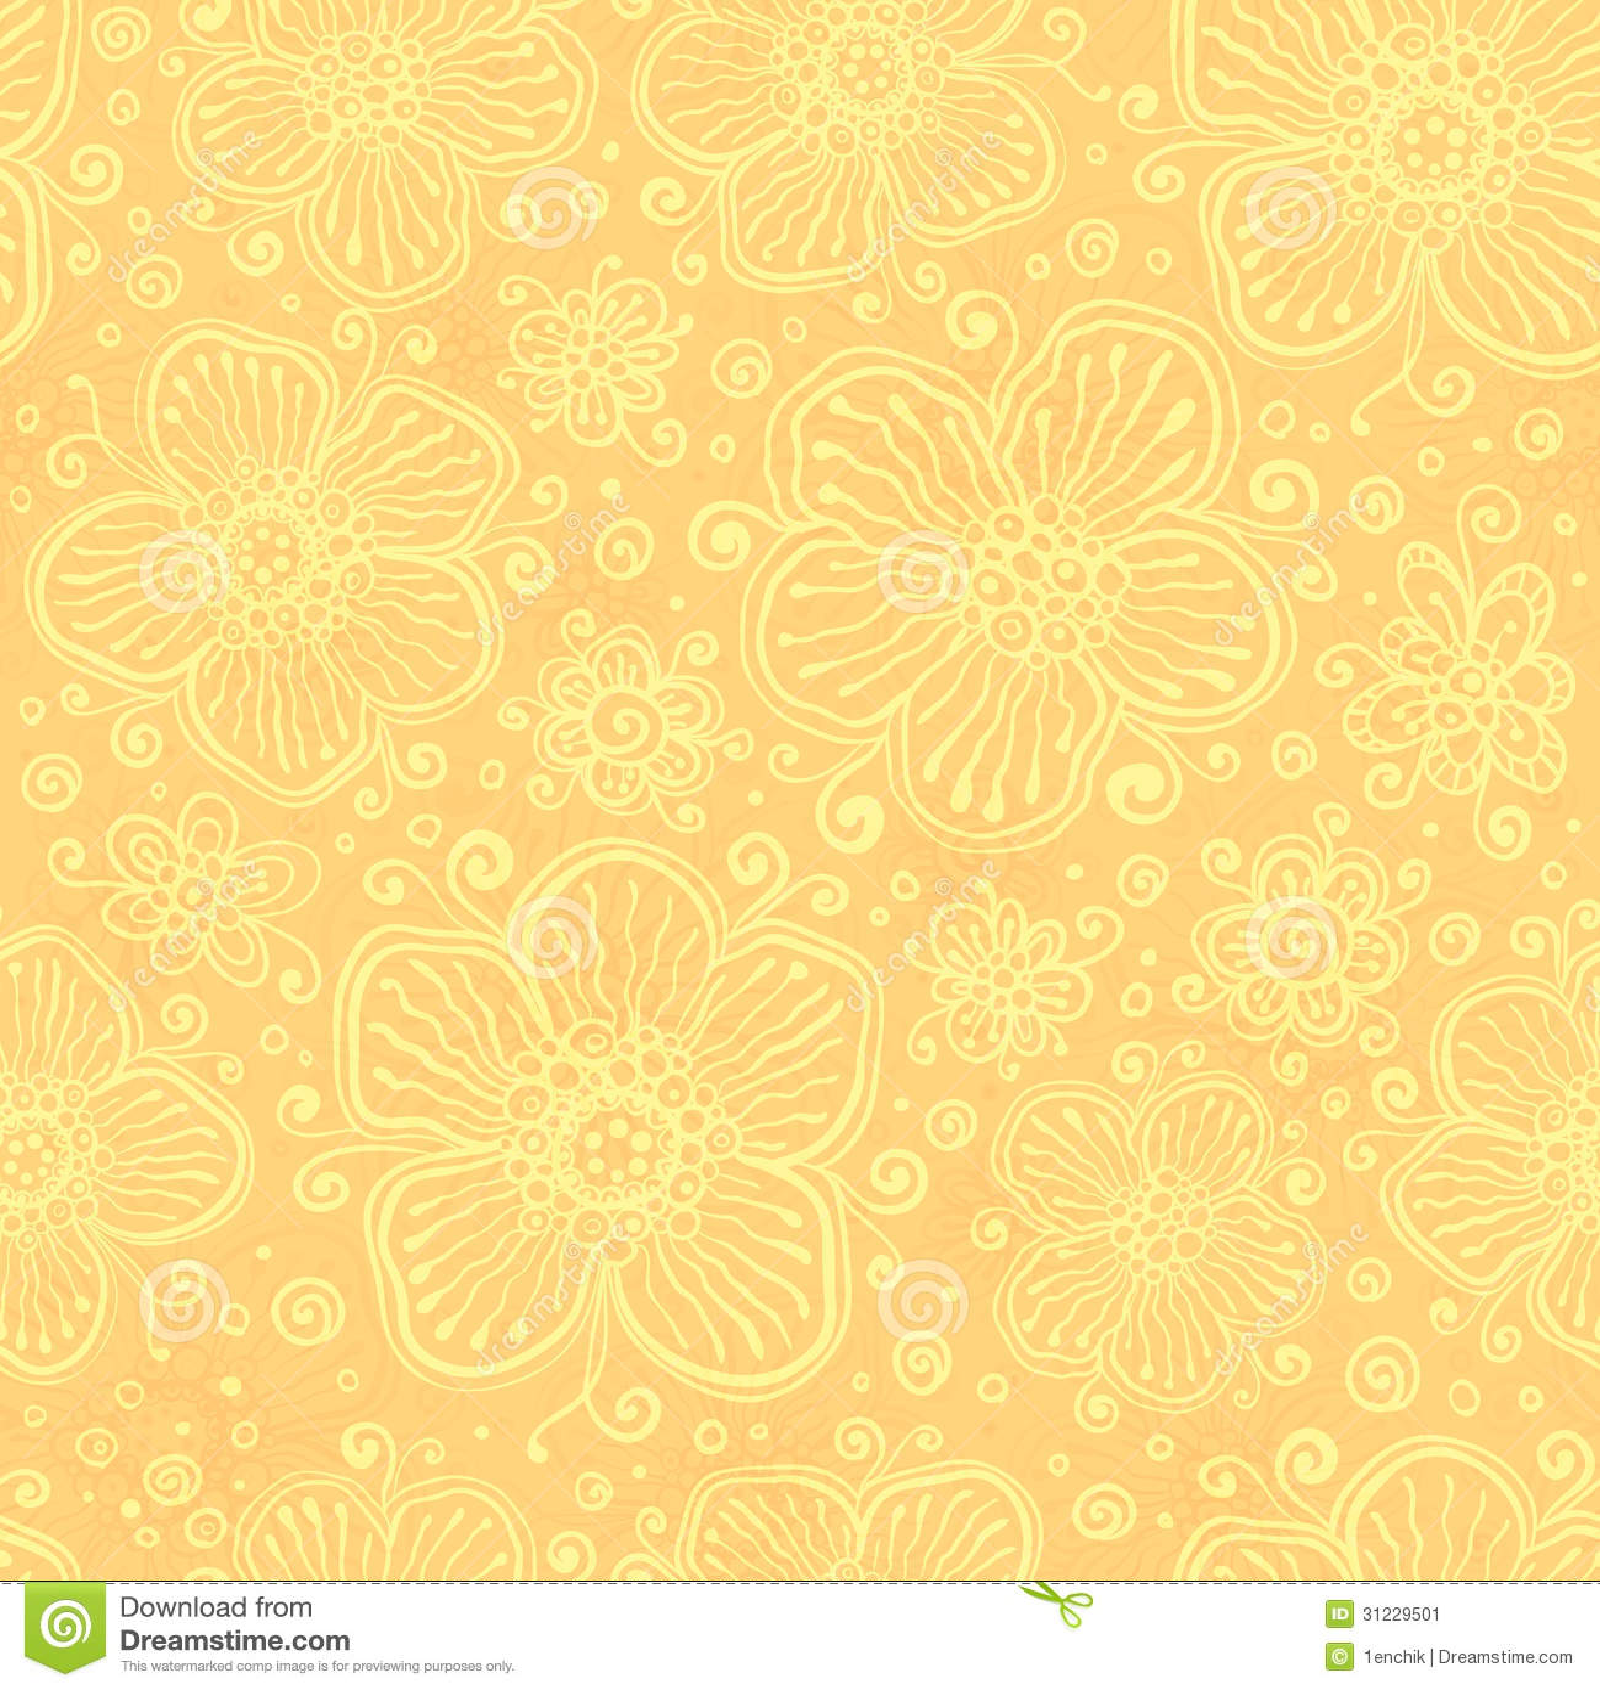 Hacer Del Baño Moco Amarillo:Light Yellow Flower Pattern